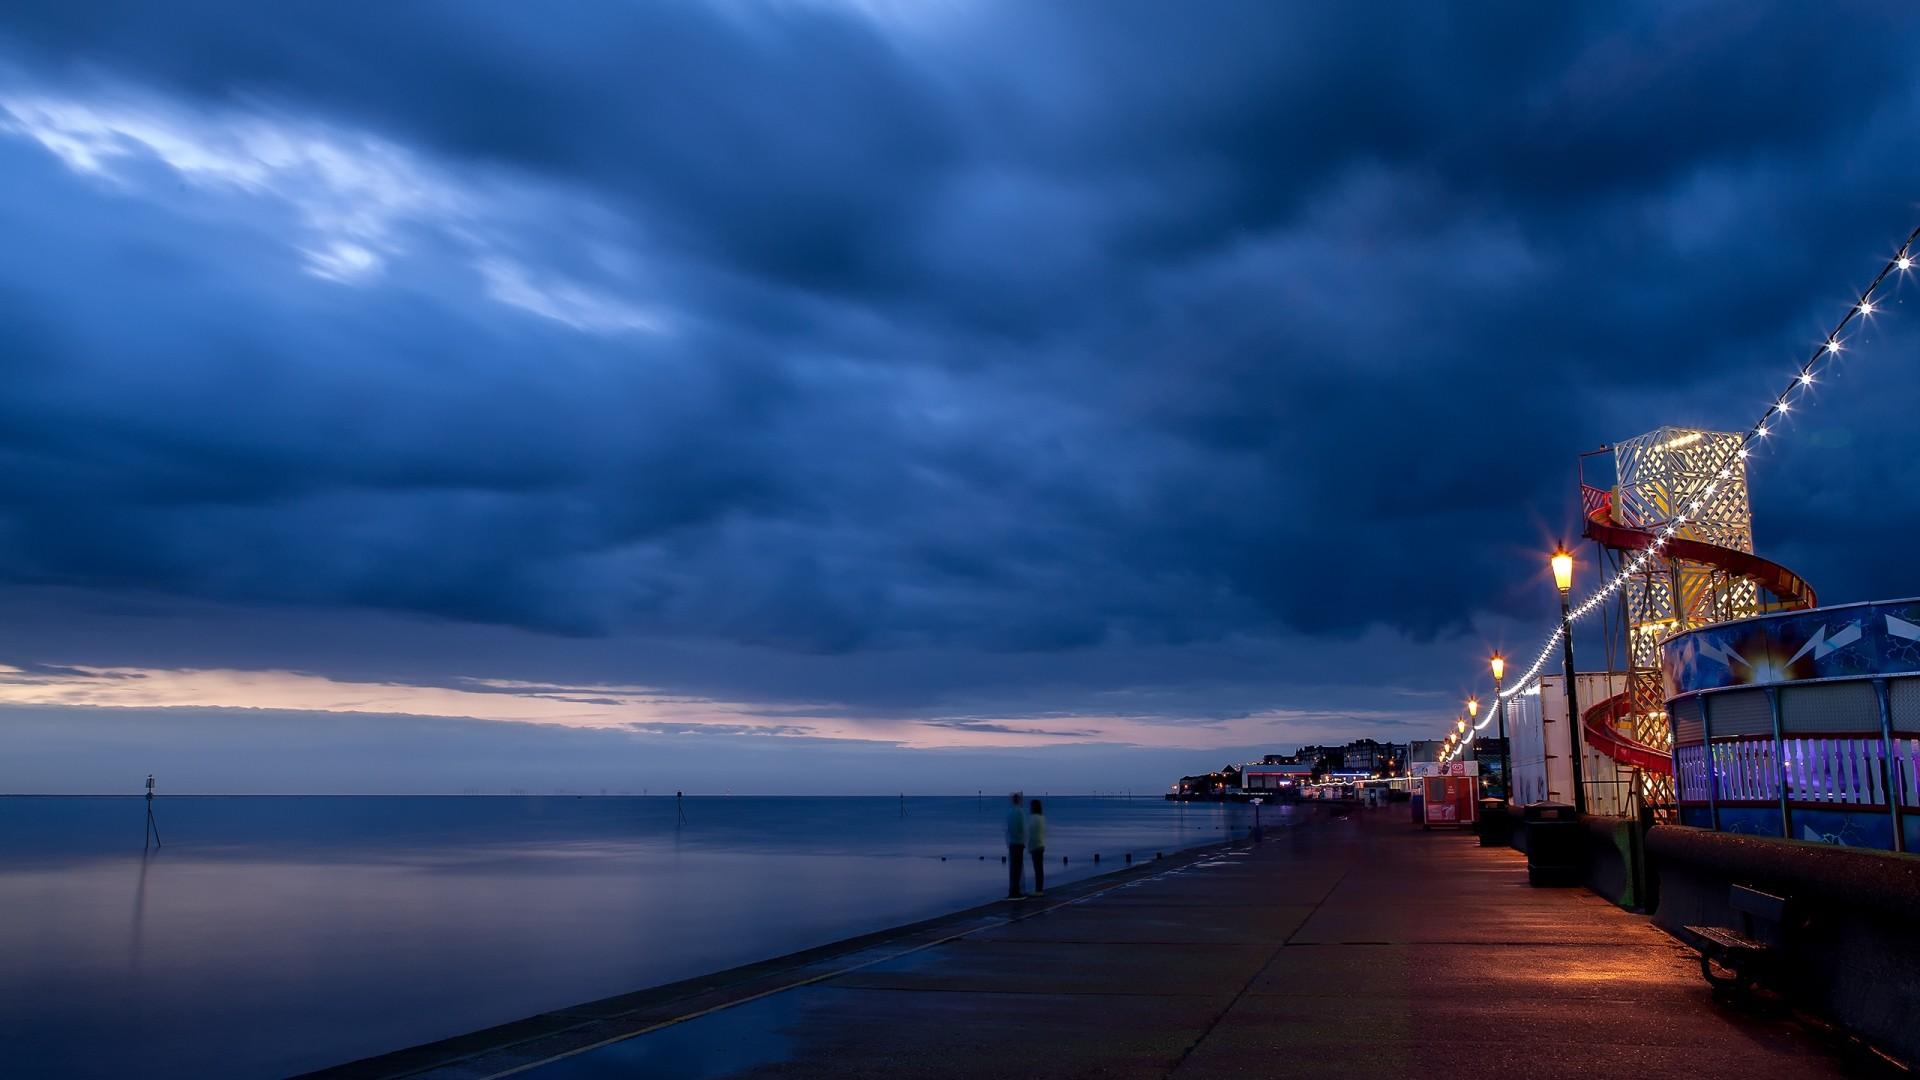 Wallpaper twilight, people, beach, night